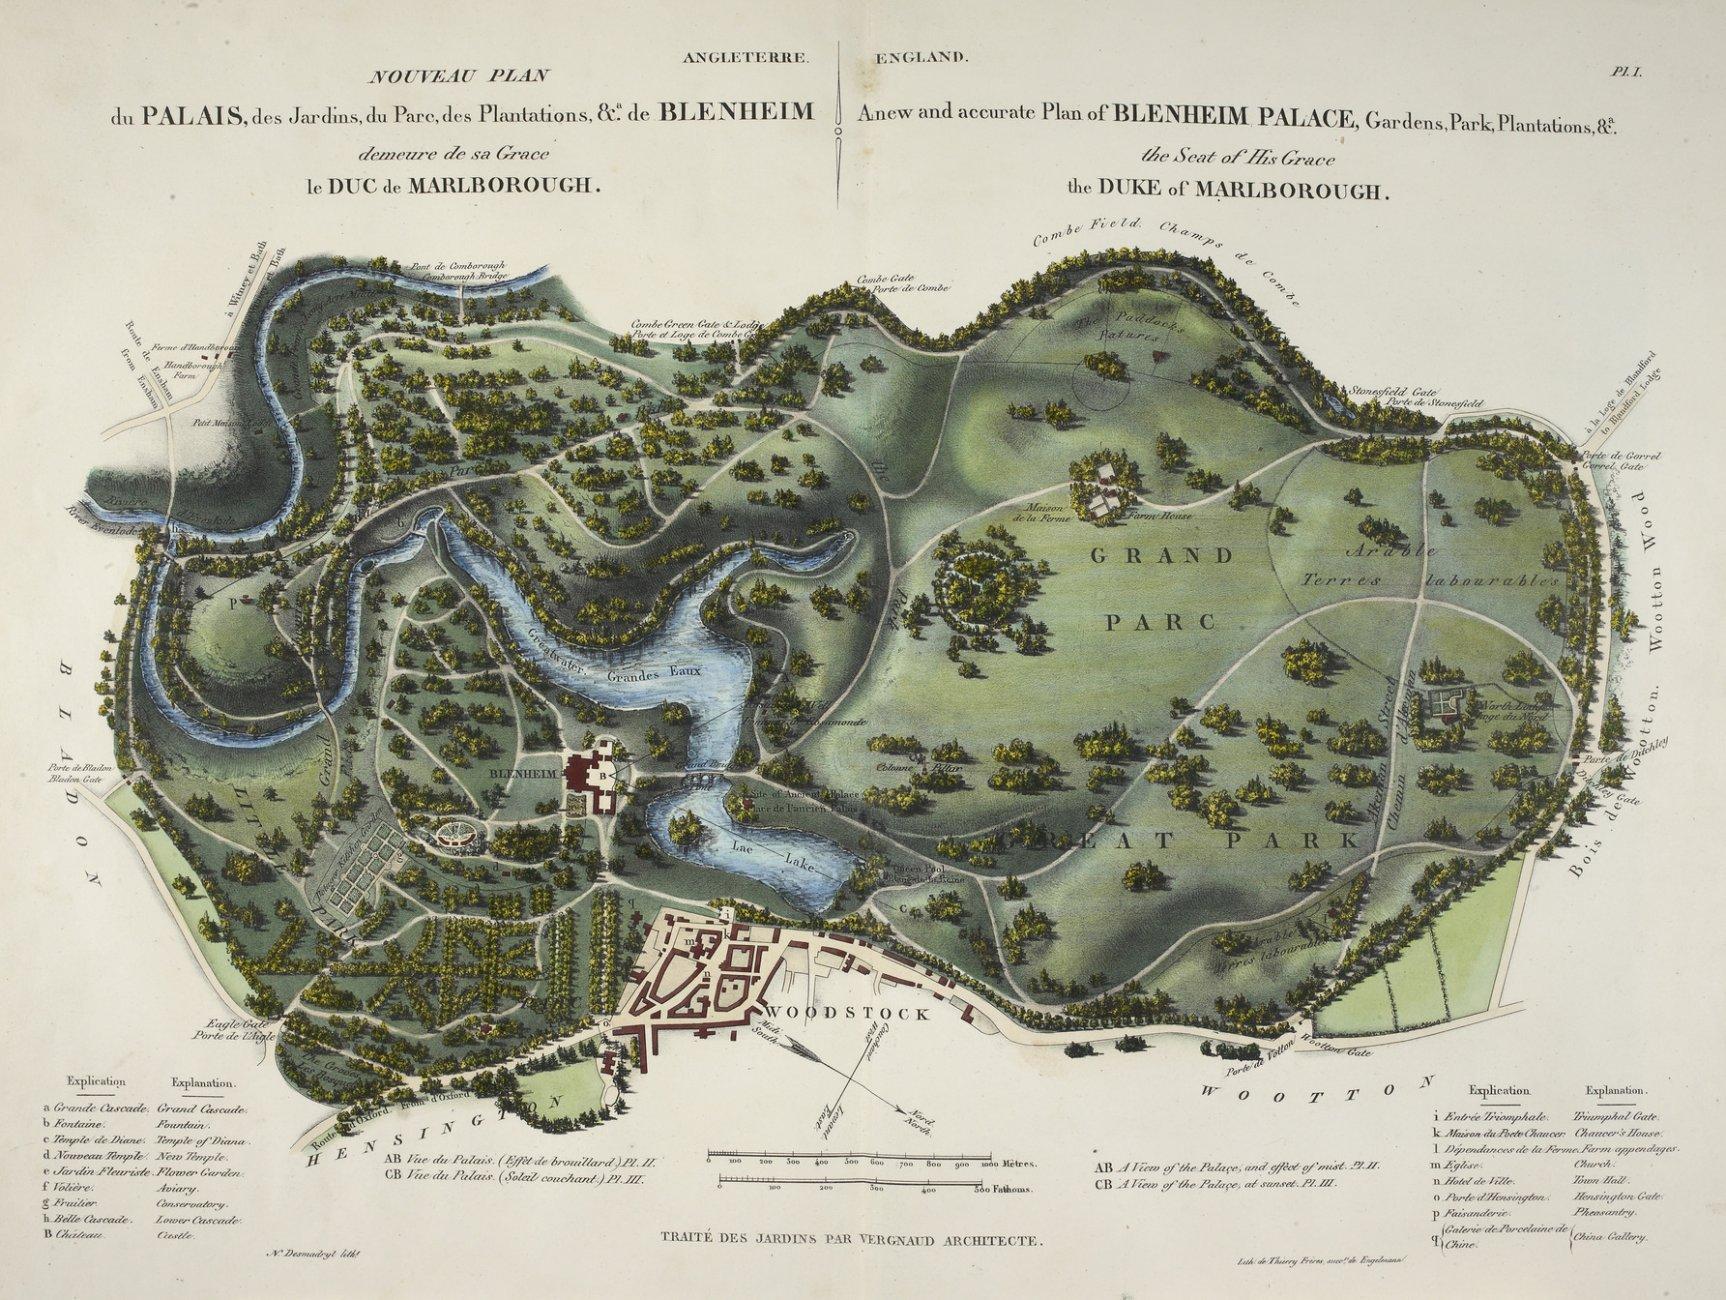 A_new_and_accurate_plan_of_Blenheim_Palace_-_L'Art_de_Créer_les_Jardins_(1835),_pl._1_-_BL.jpg